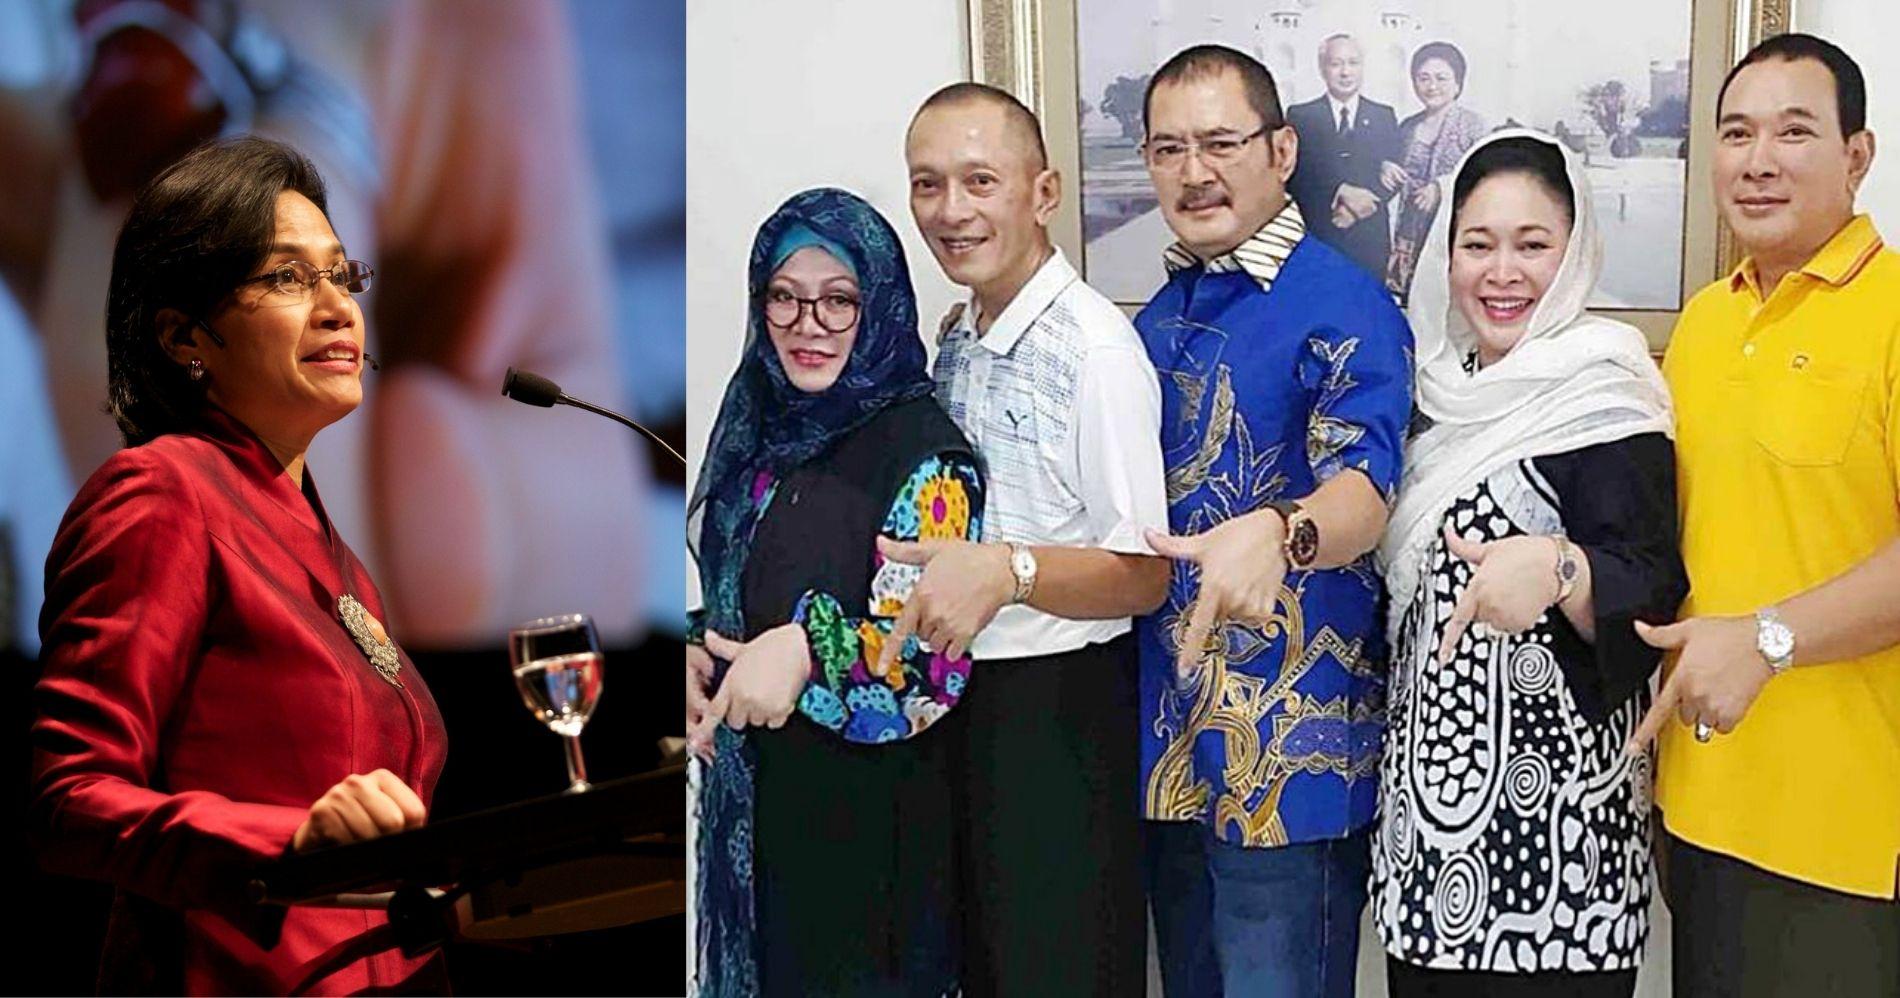 Sri Mulyani Kejar Utang Anak Soeharto Illustration Web Bisnis Muda - Image: Wikimedia - Partai Berkarya